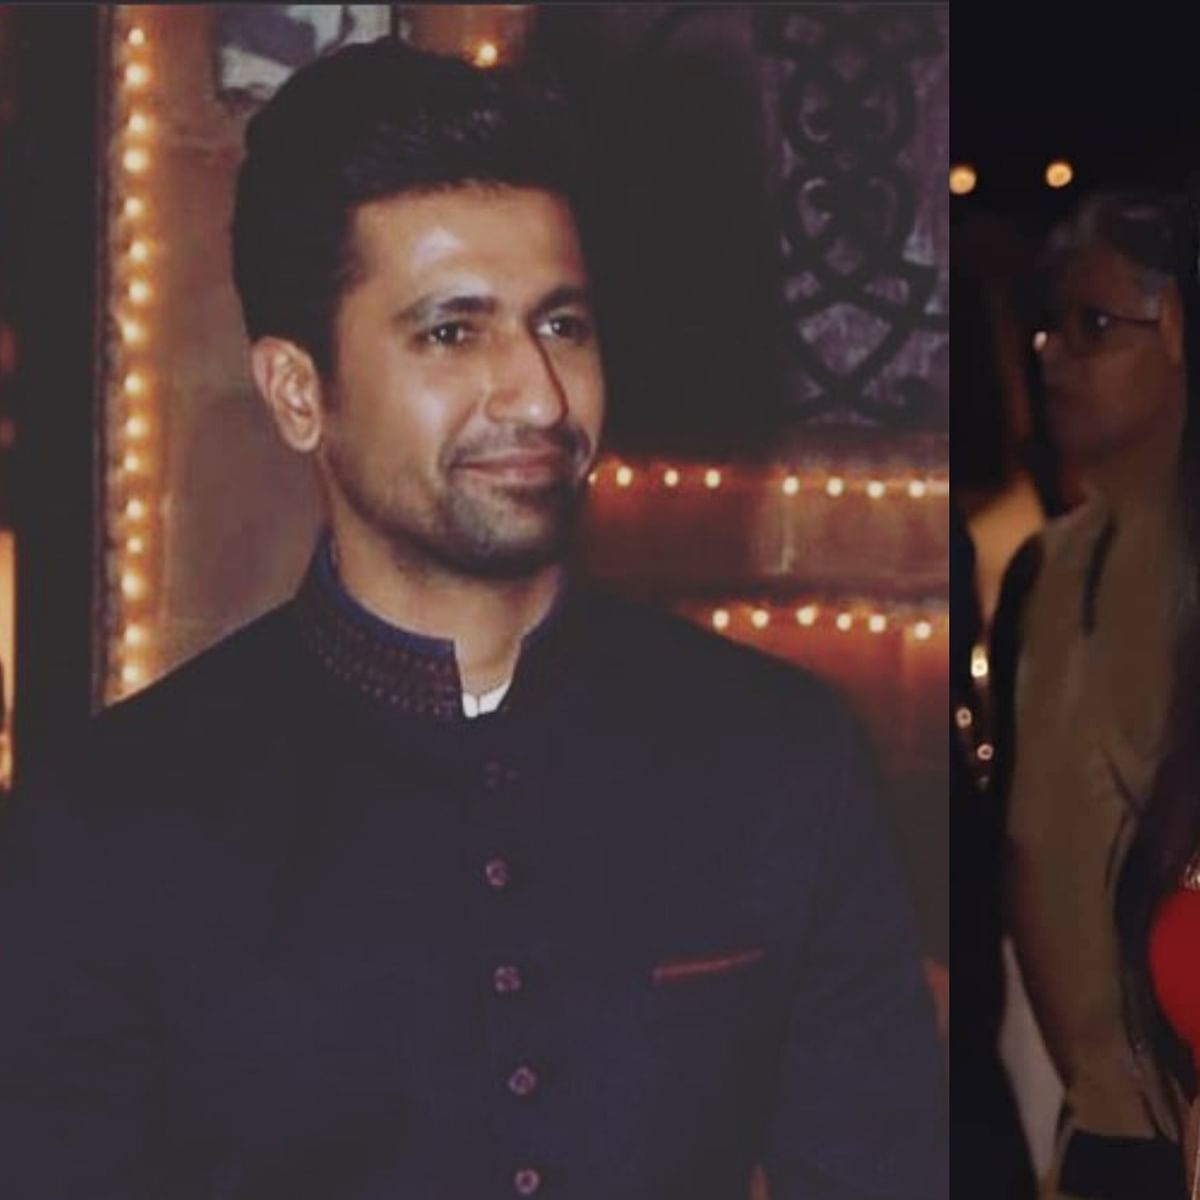 Vicky Kaushal, Katrina Kaif spark off dating rumours at Diwali party